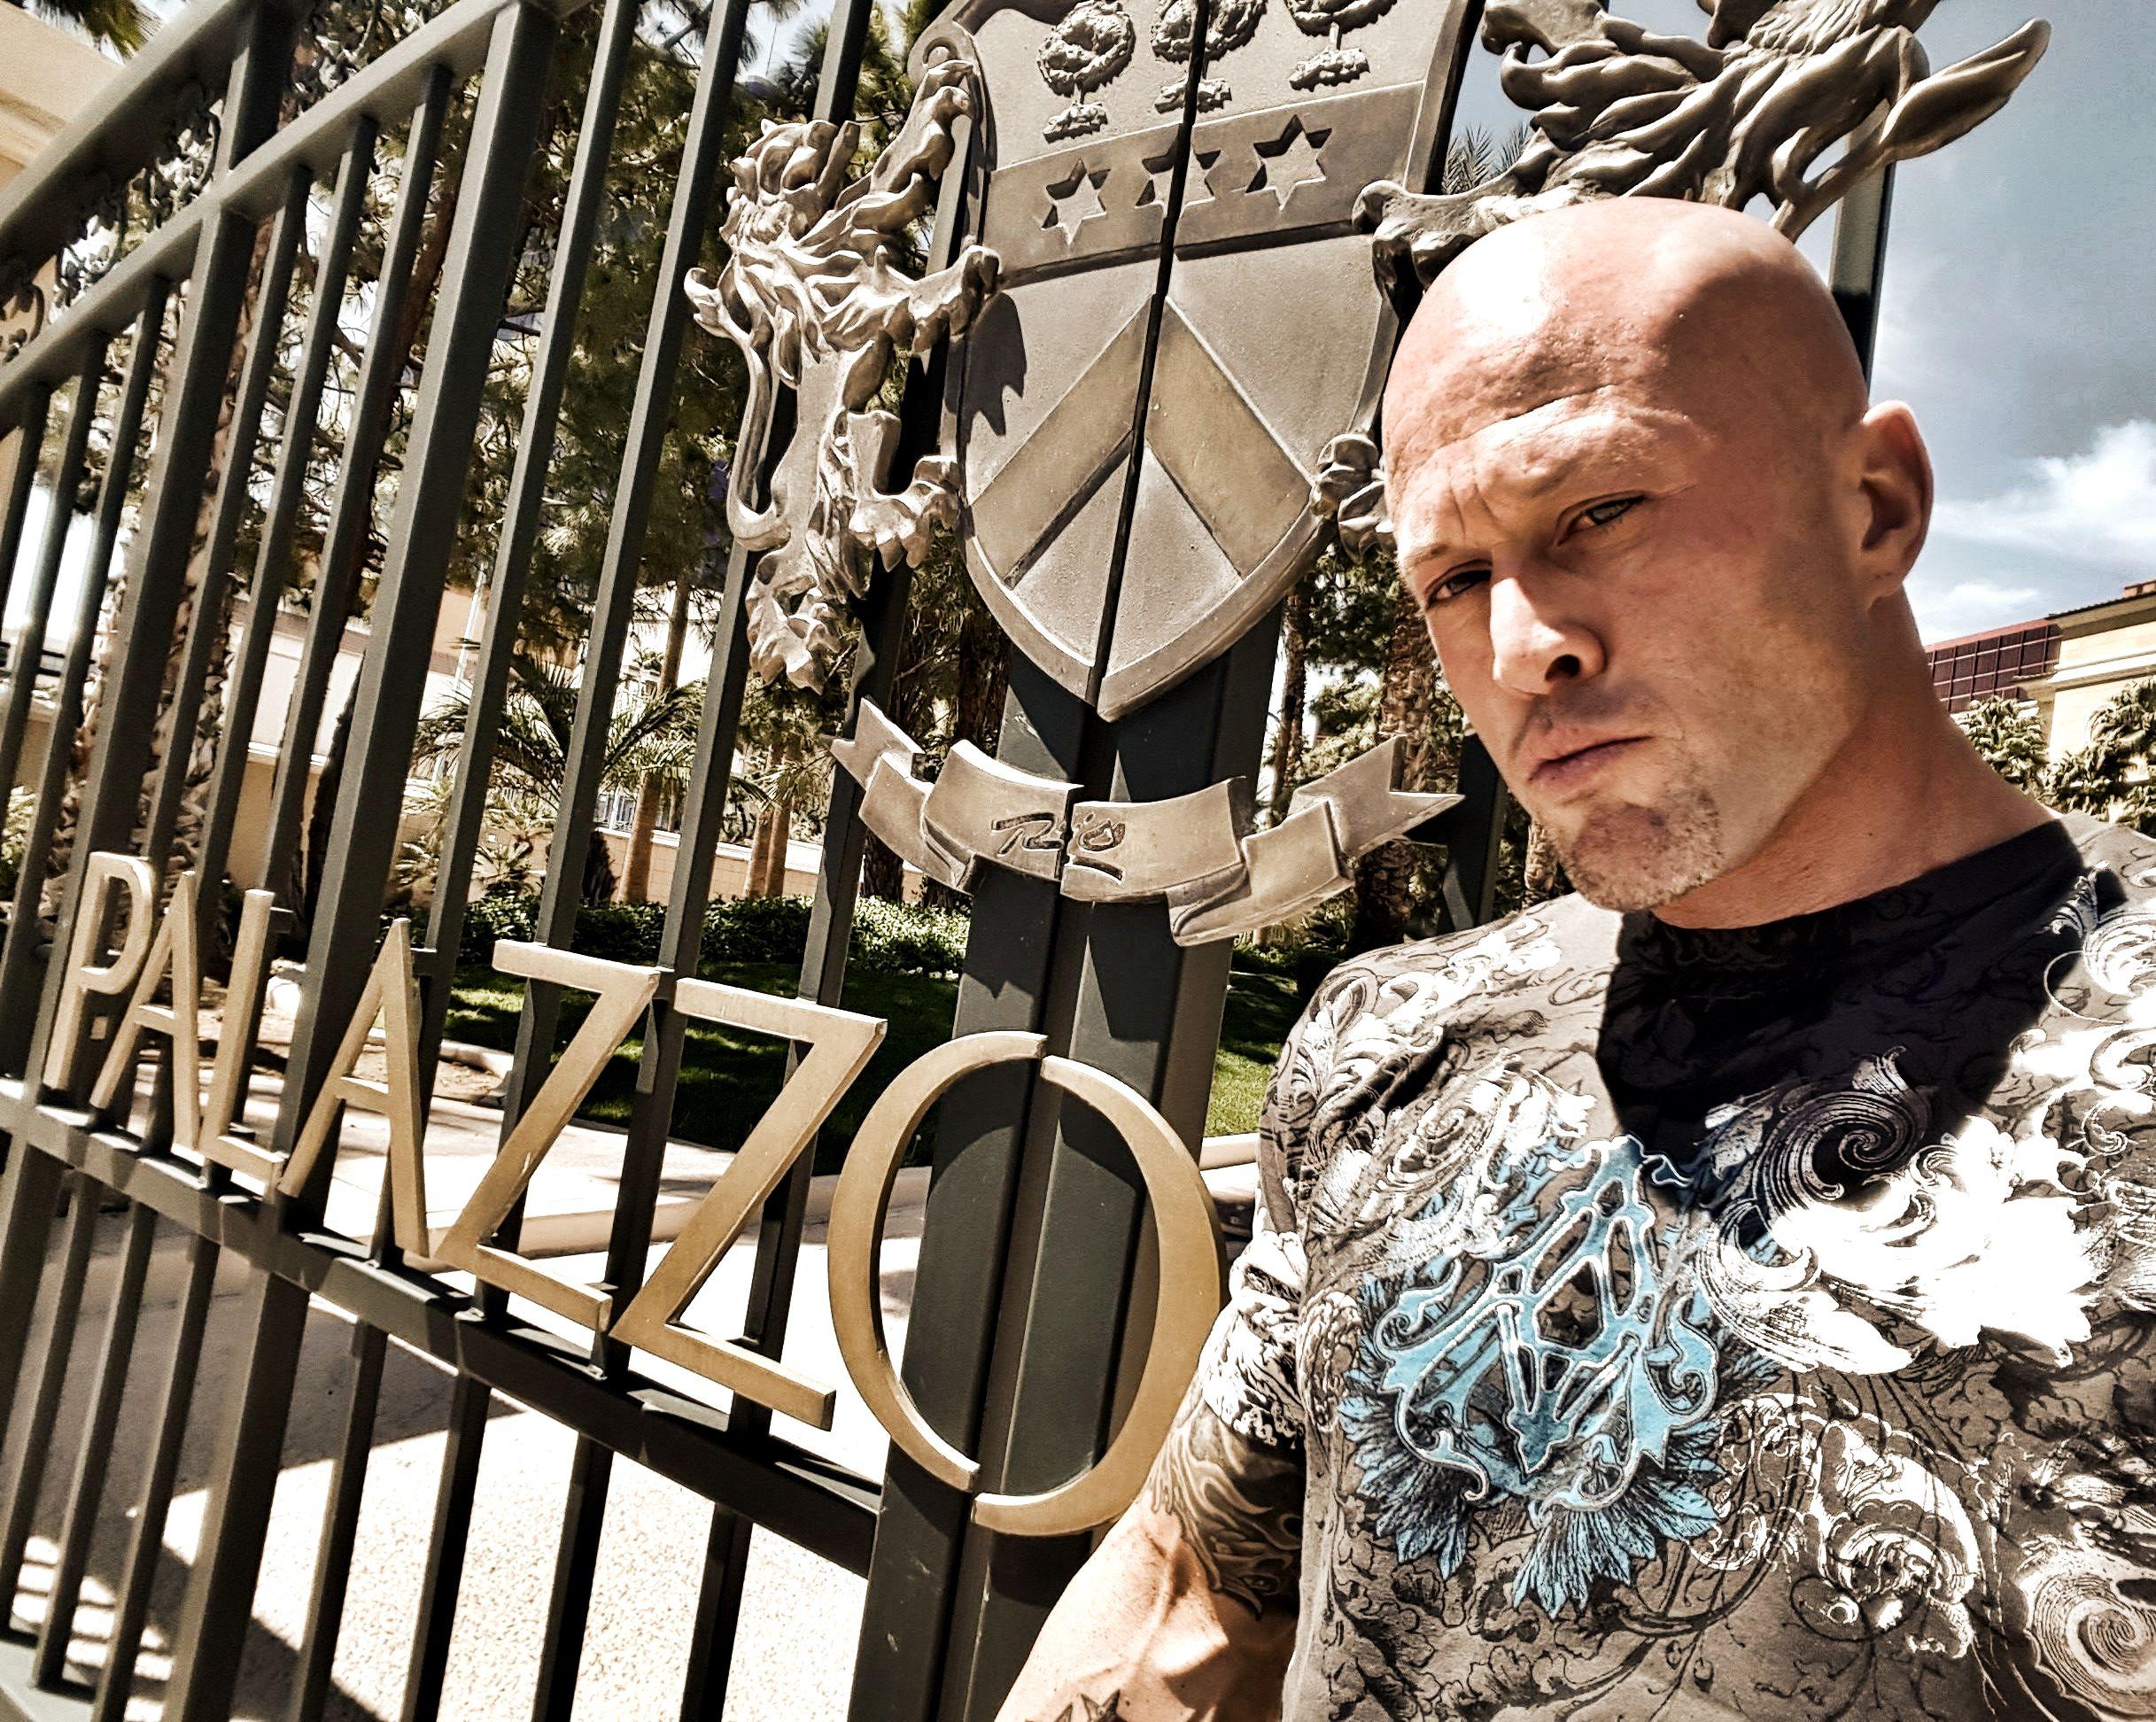 Actor & Model John Joseph Quinlan Outside Palazzo Suites Rio Las Vegas 2016. #JohnQuinlan